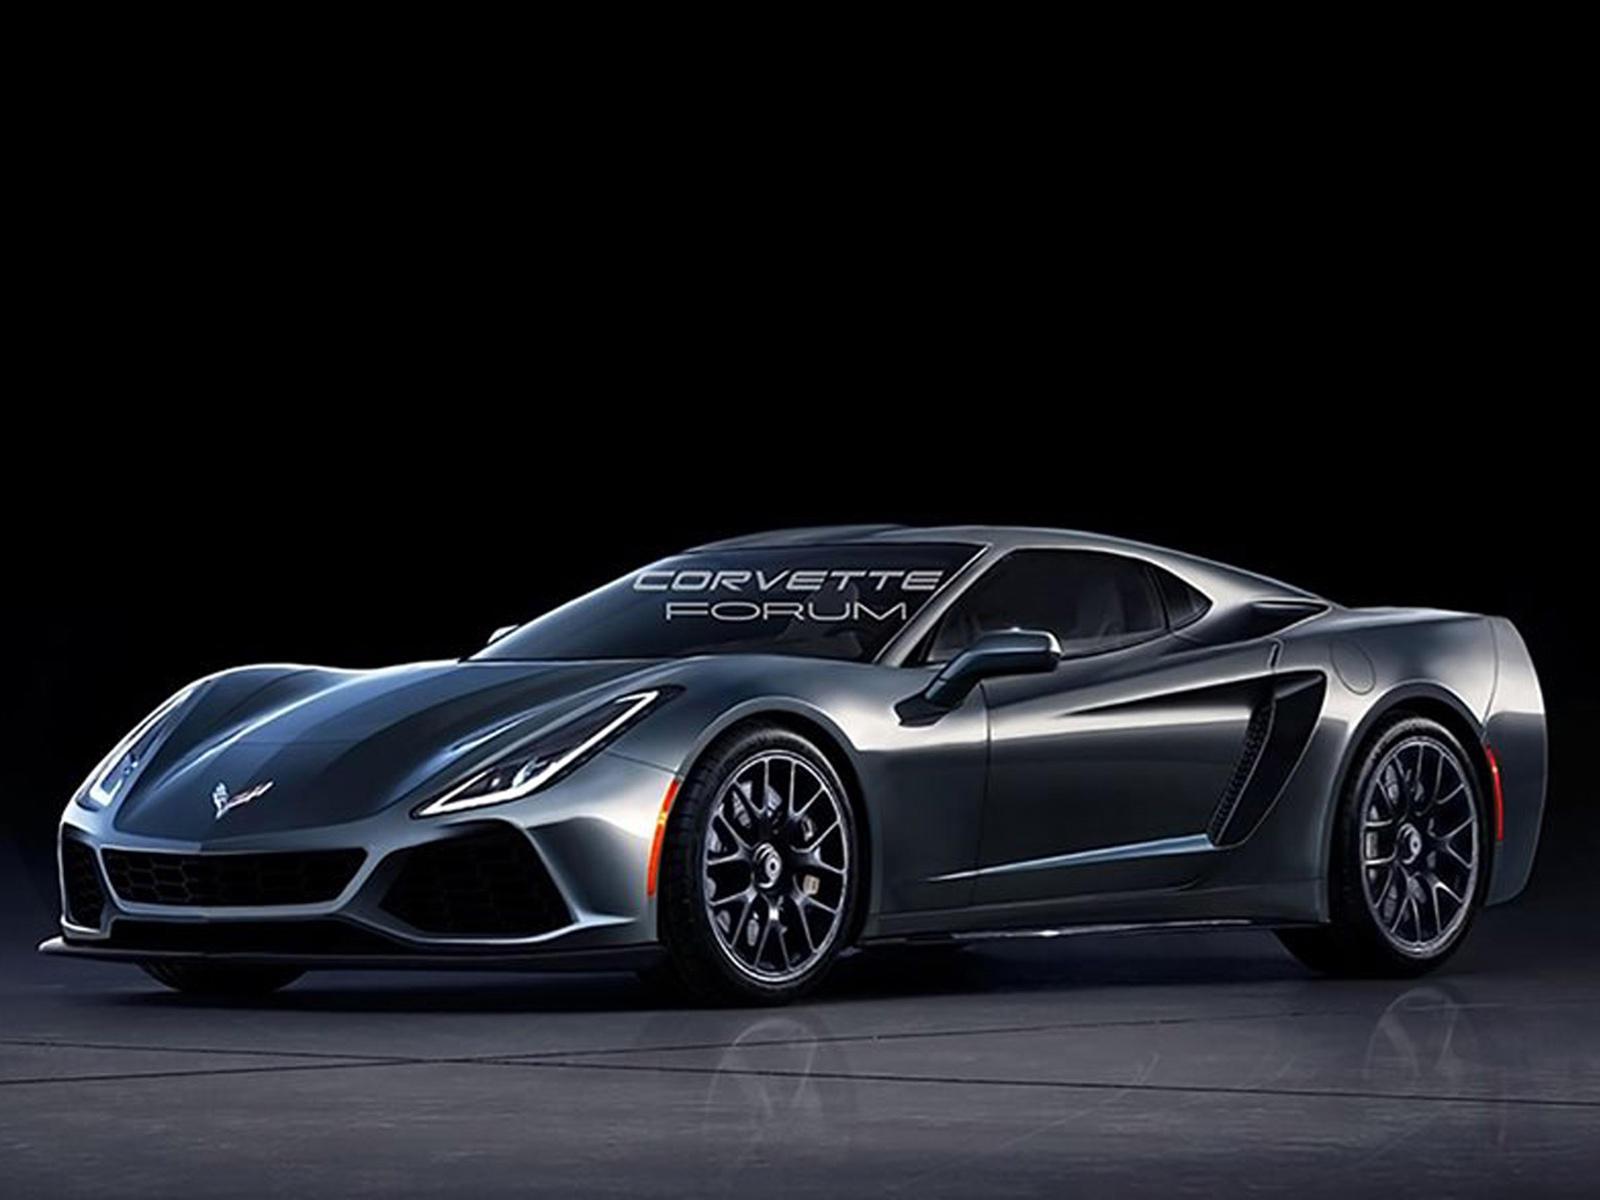 c8 chevrolet corvette has a new reveal date